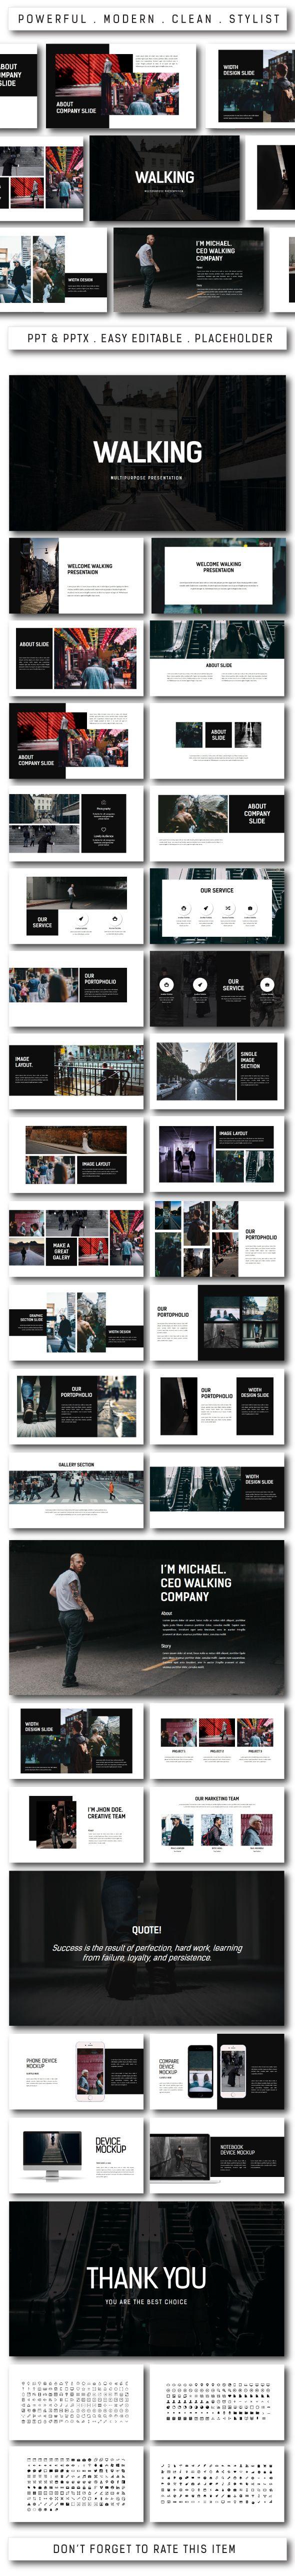 Walking Multipurpose #Powerpoint - PowerPoint Templates Presentation Templates